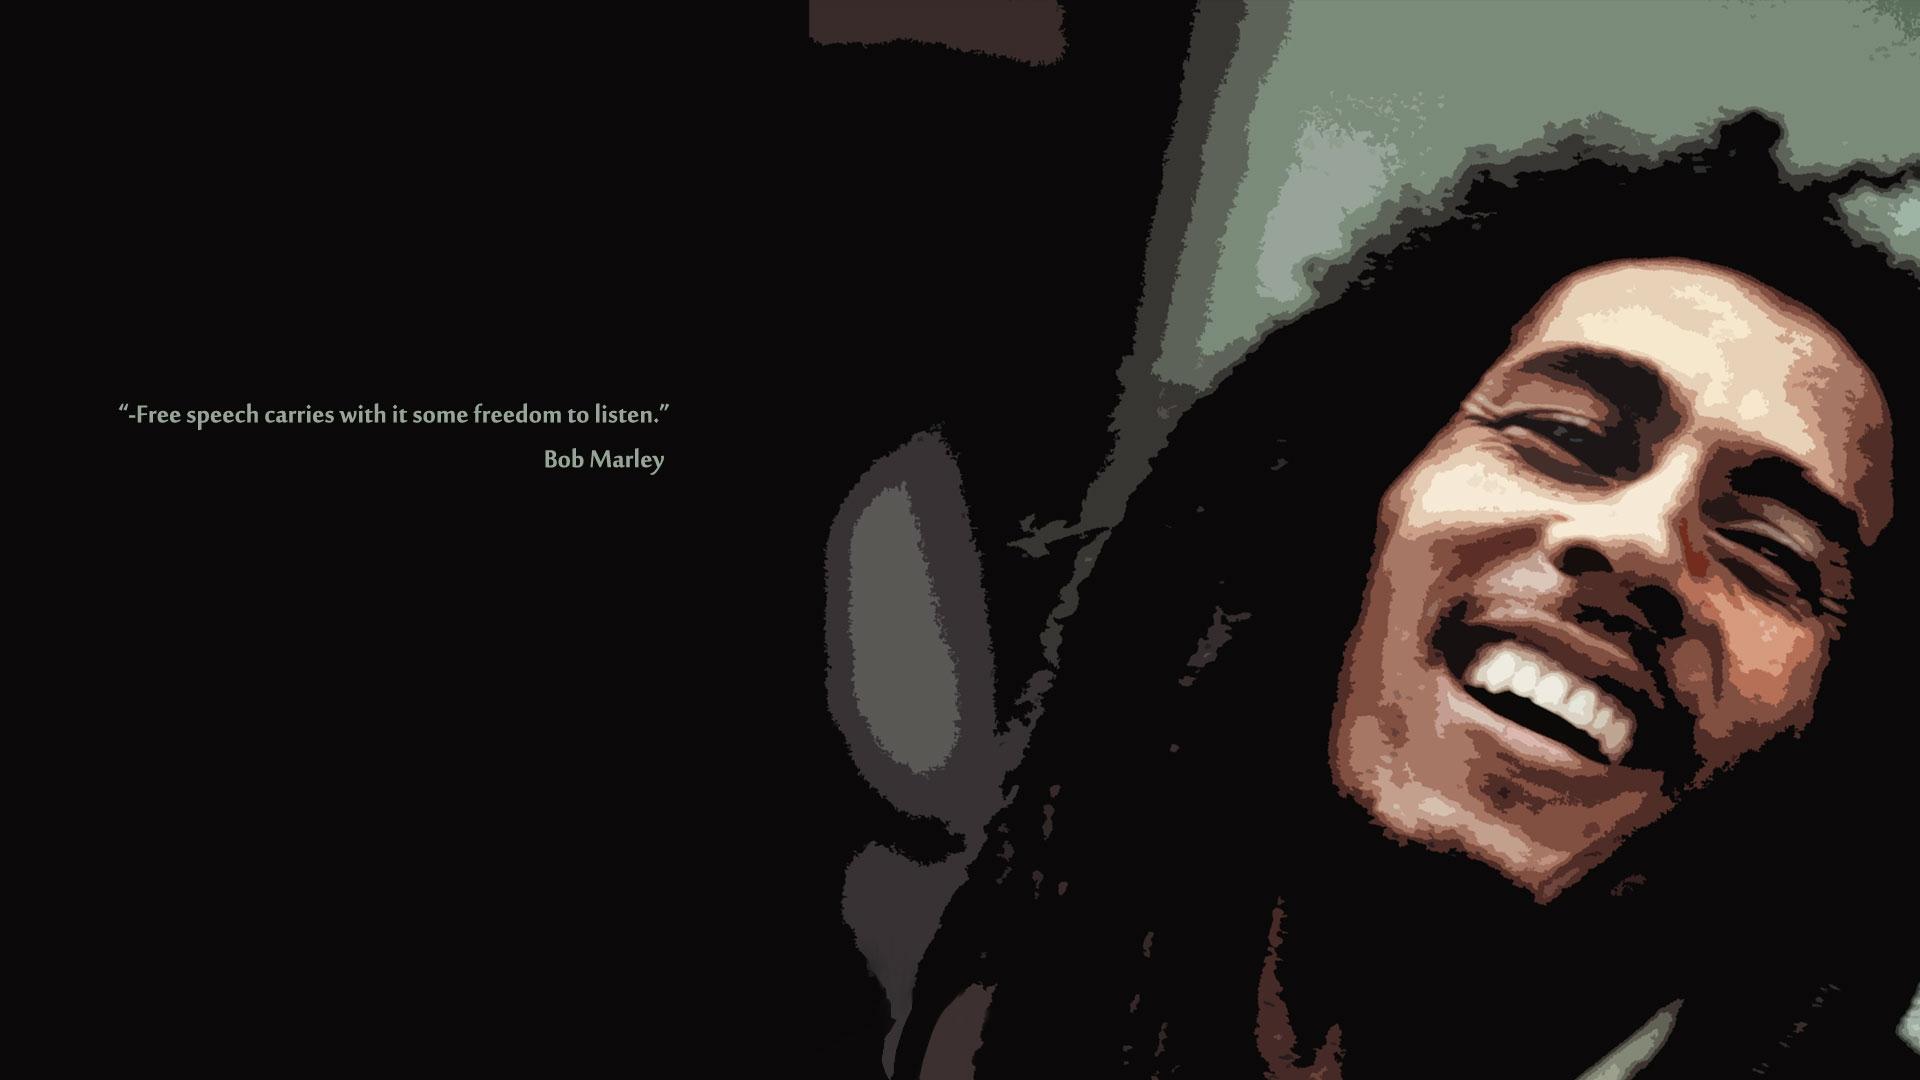 Quote Dreadlocks Phrase Bob Marley Smile Beard Human Darkness Chin Shout Computer Wallpaper Font Album Cover